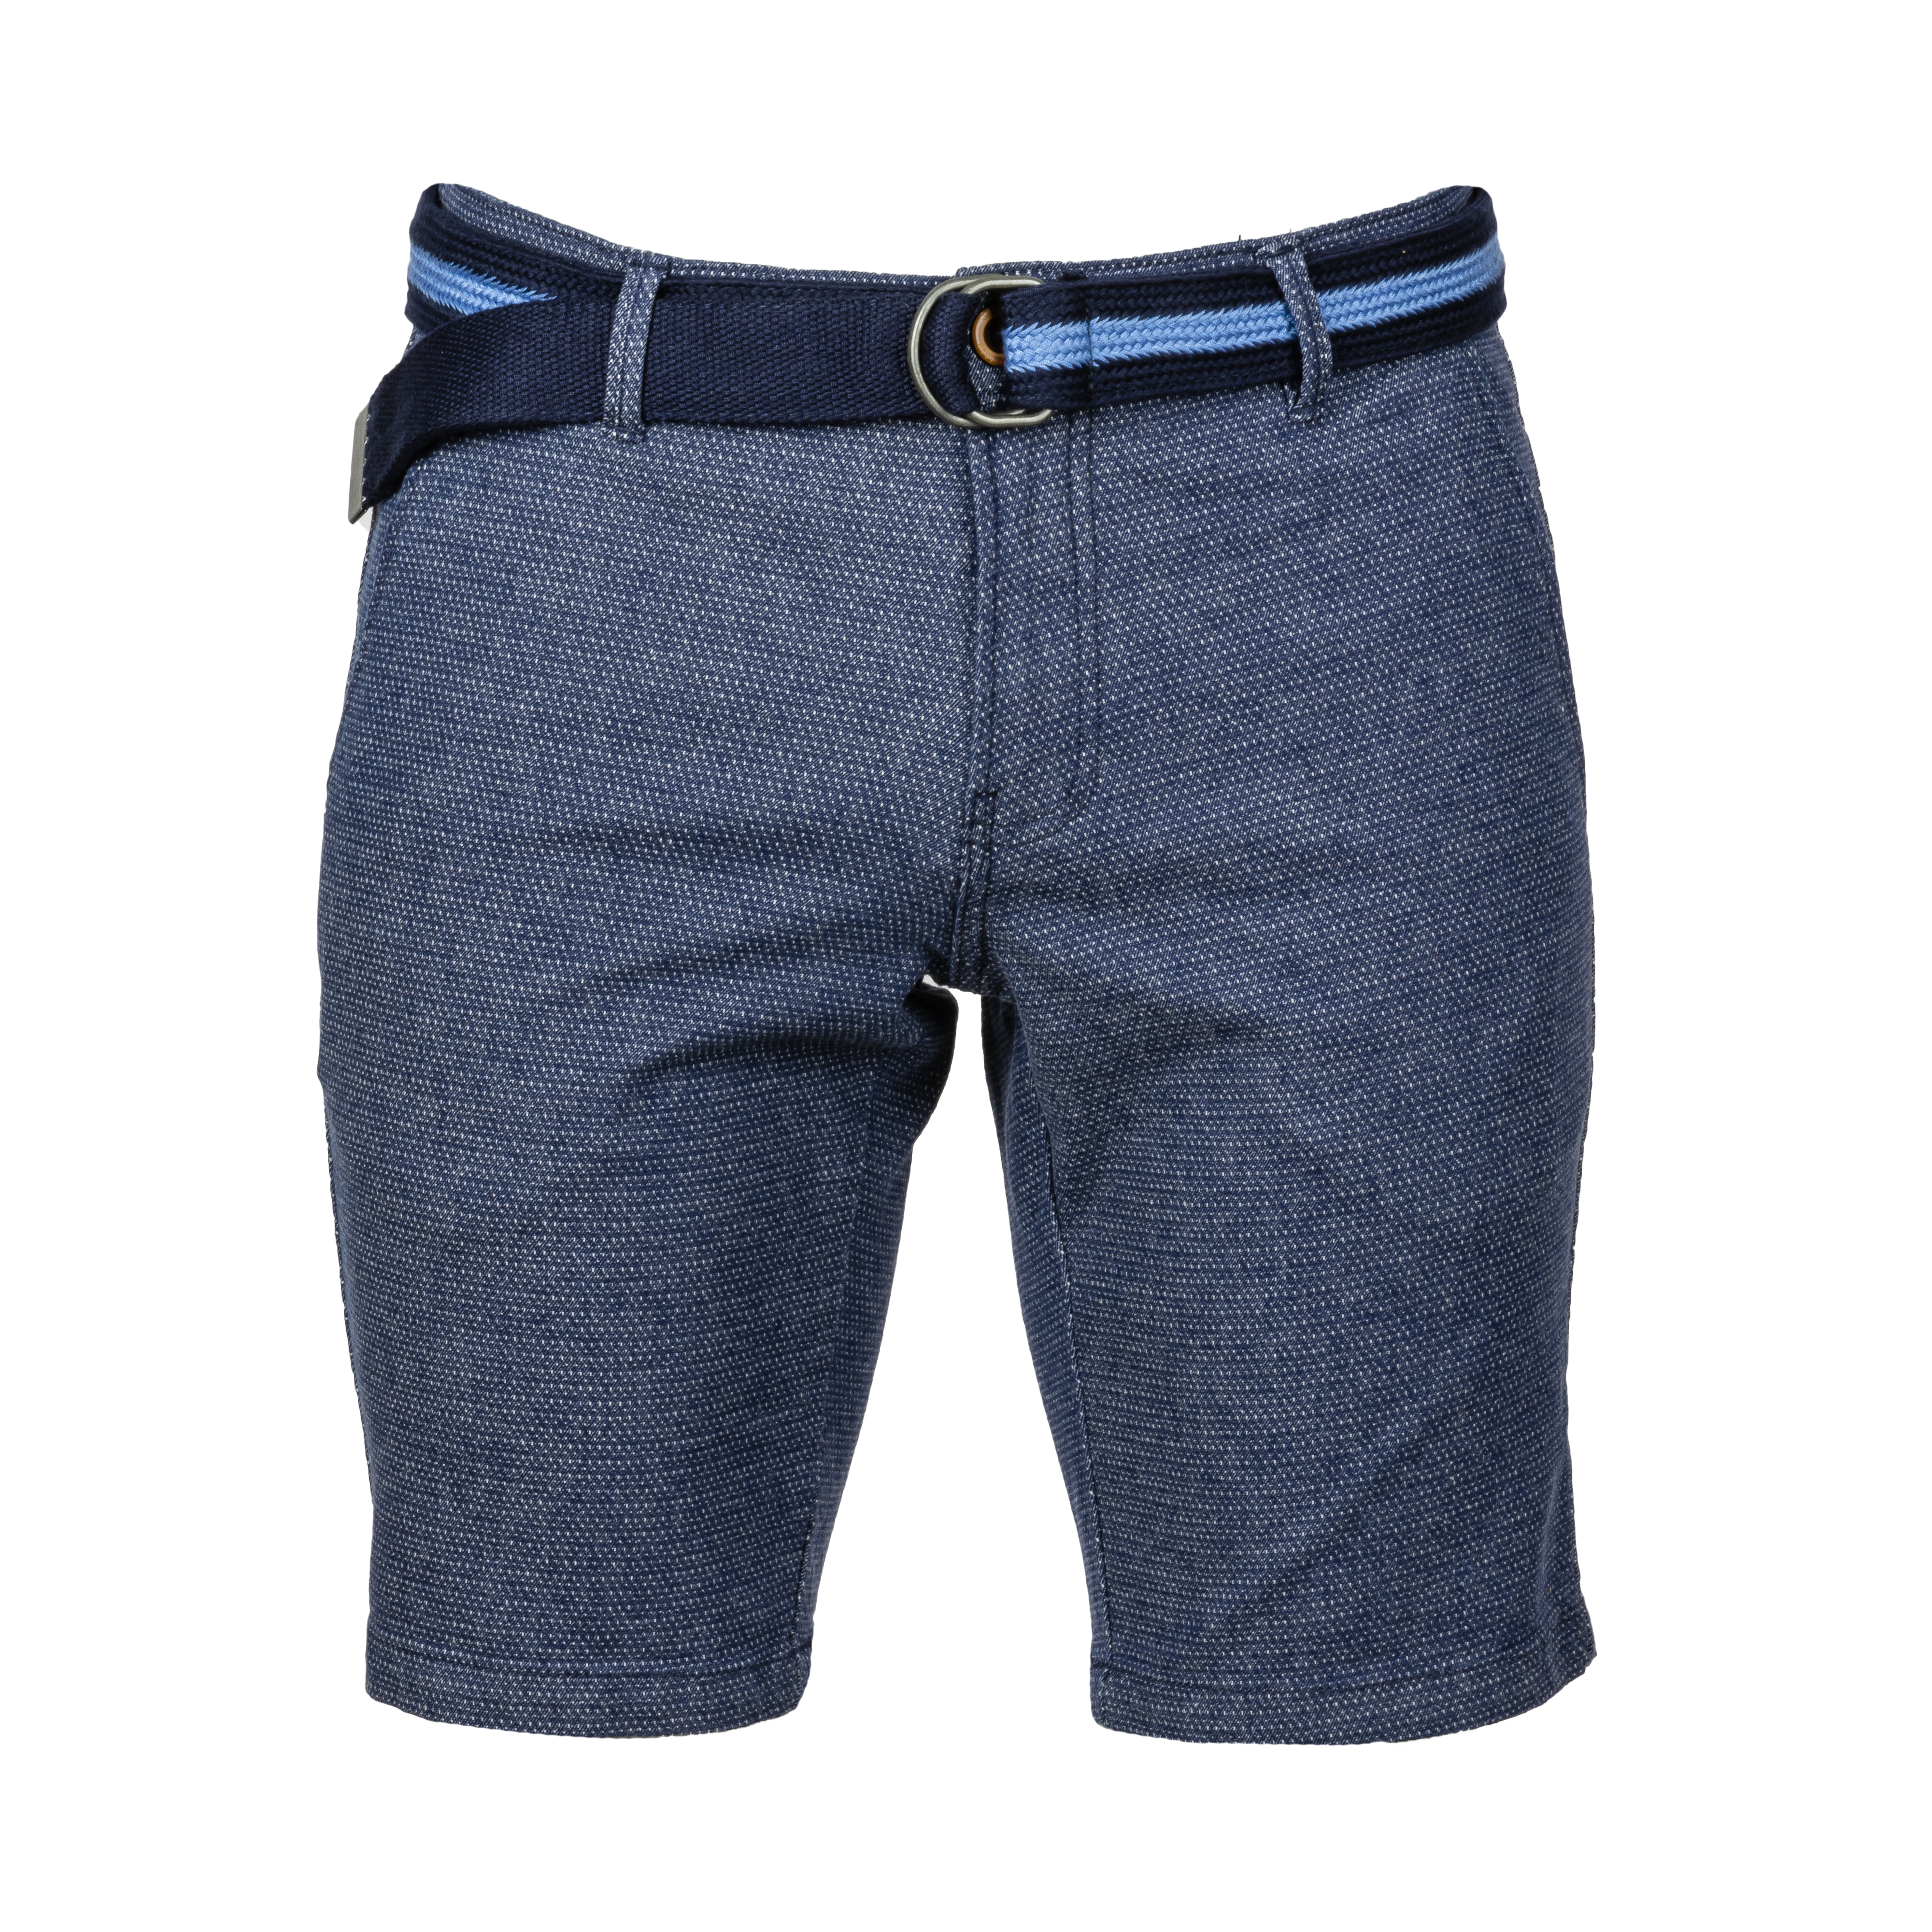 Short Teddy Smith Chino en coton stretch bleu marine à motifs blancs avec ceinture tressée